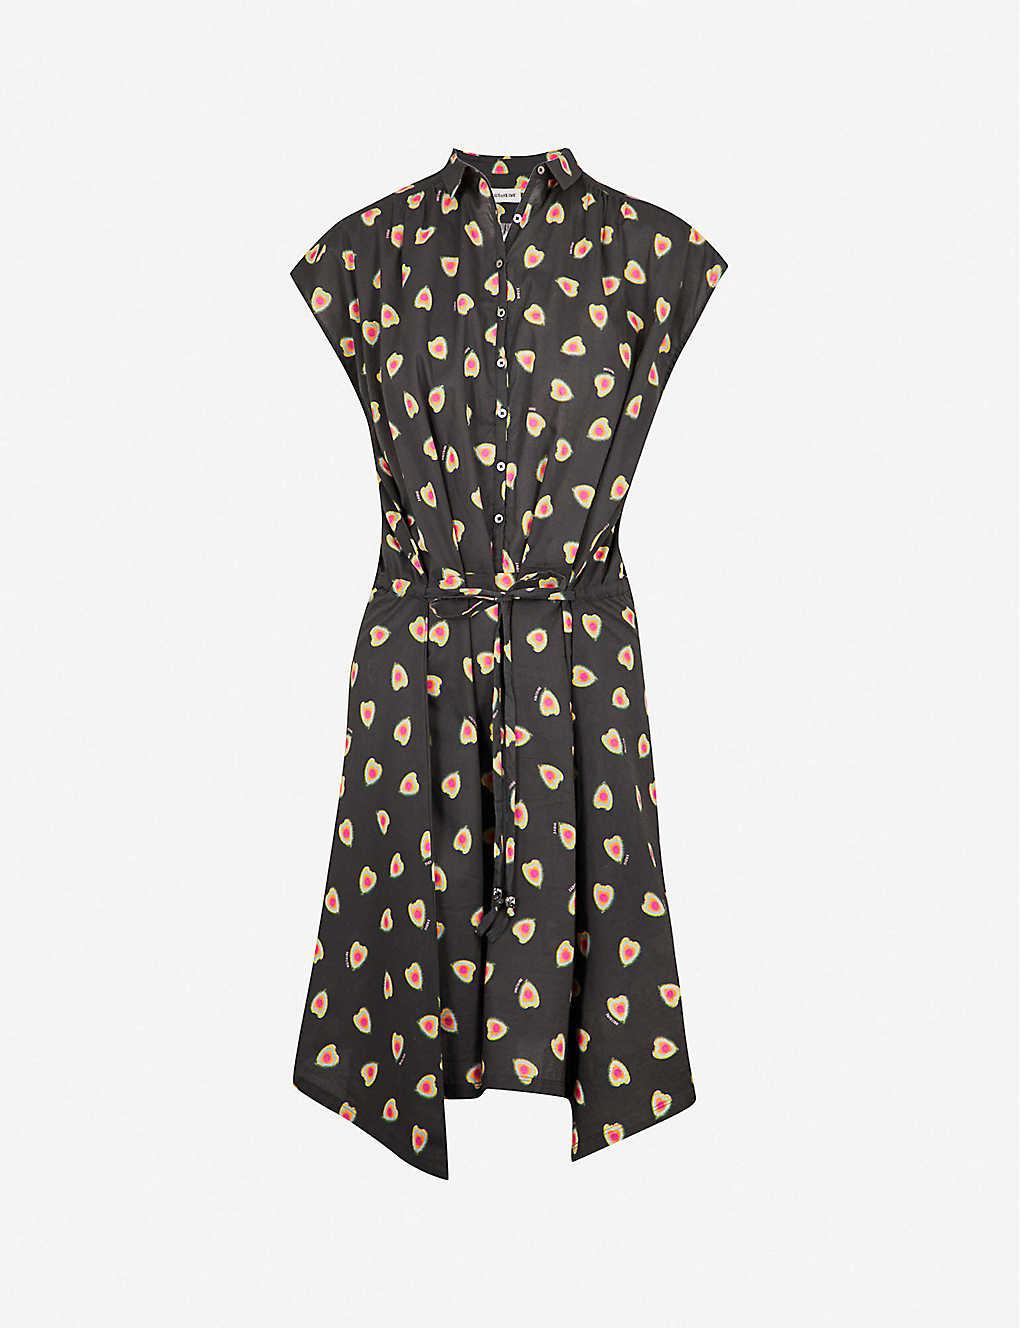 Cotton Requiem Heart Zadig Dress Shirt amp;voltaire Print fg07Iq